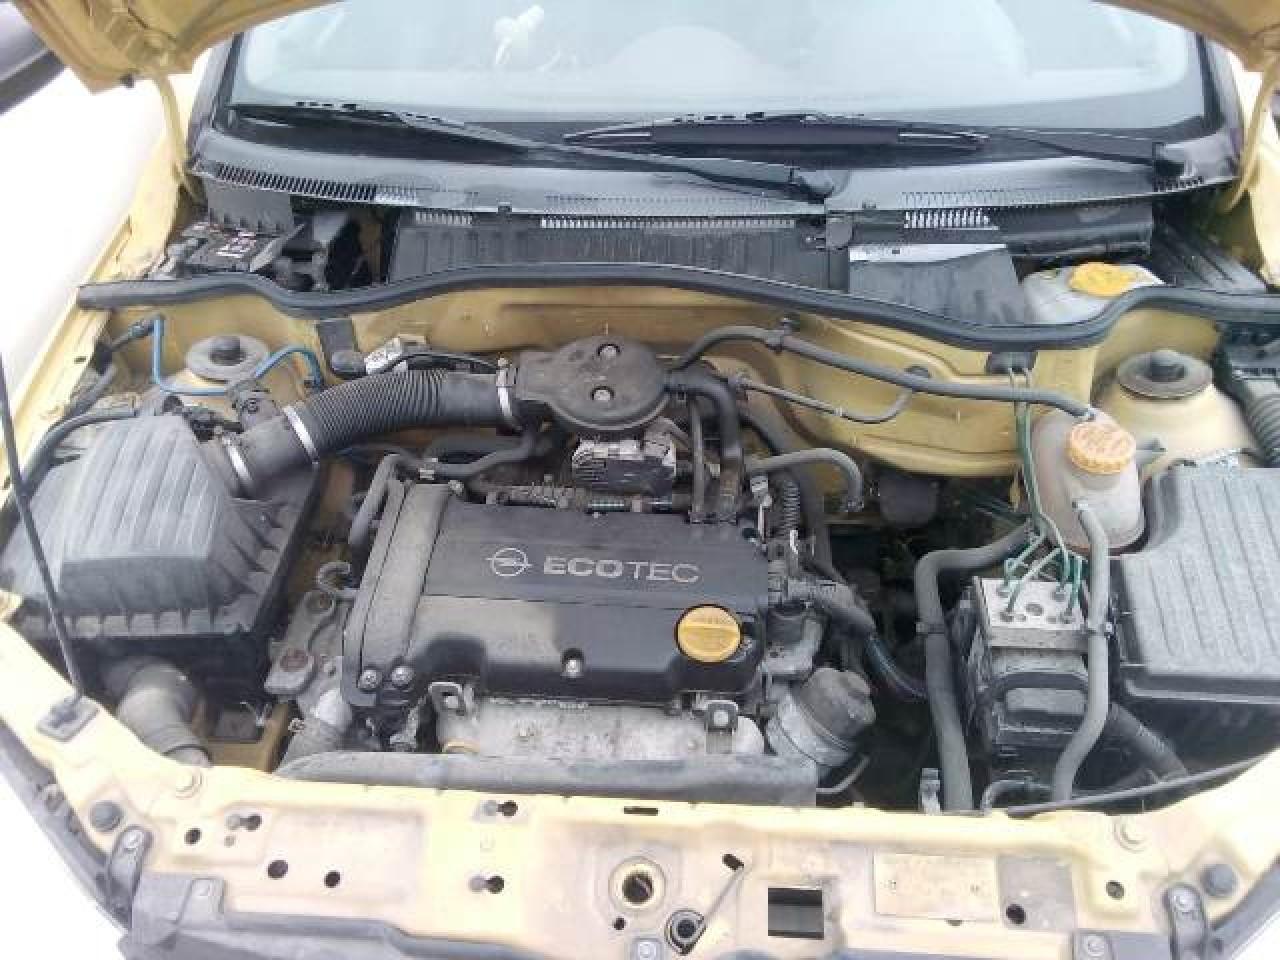 Dezmembrez Opel Corsa C 1.2i (1199cc-55kw-75hp); 3-hatchback